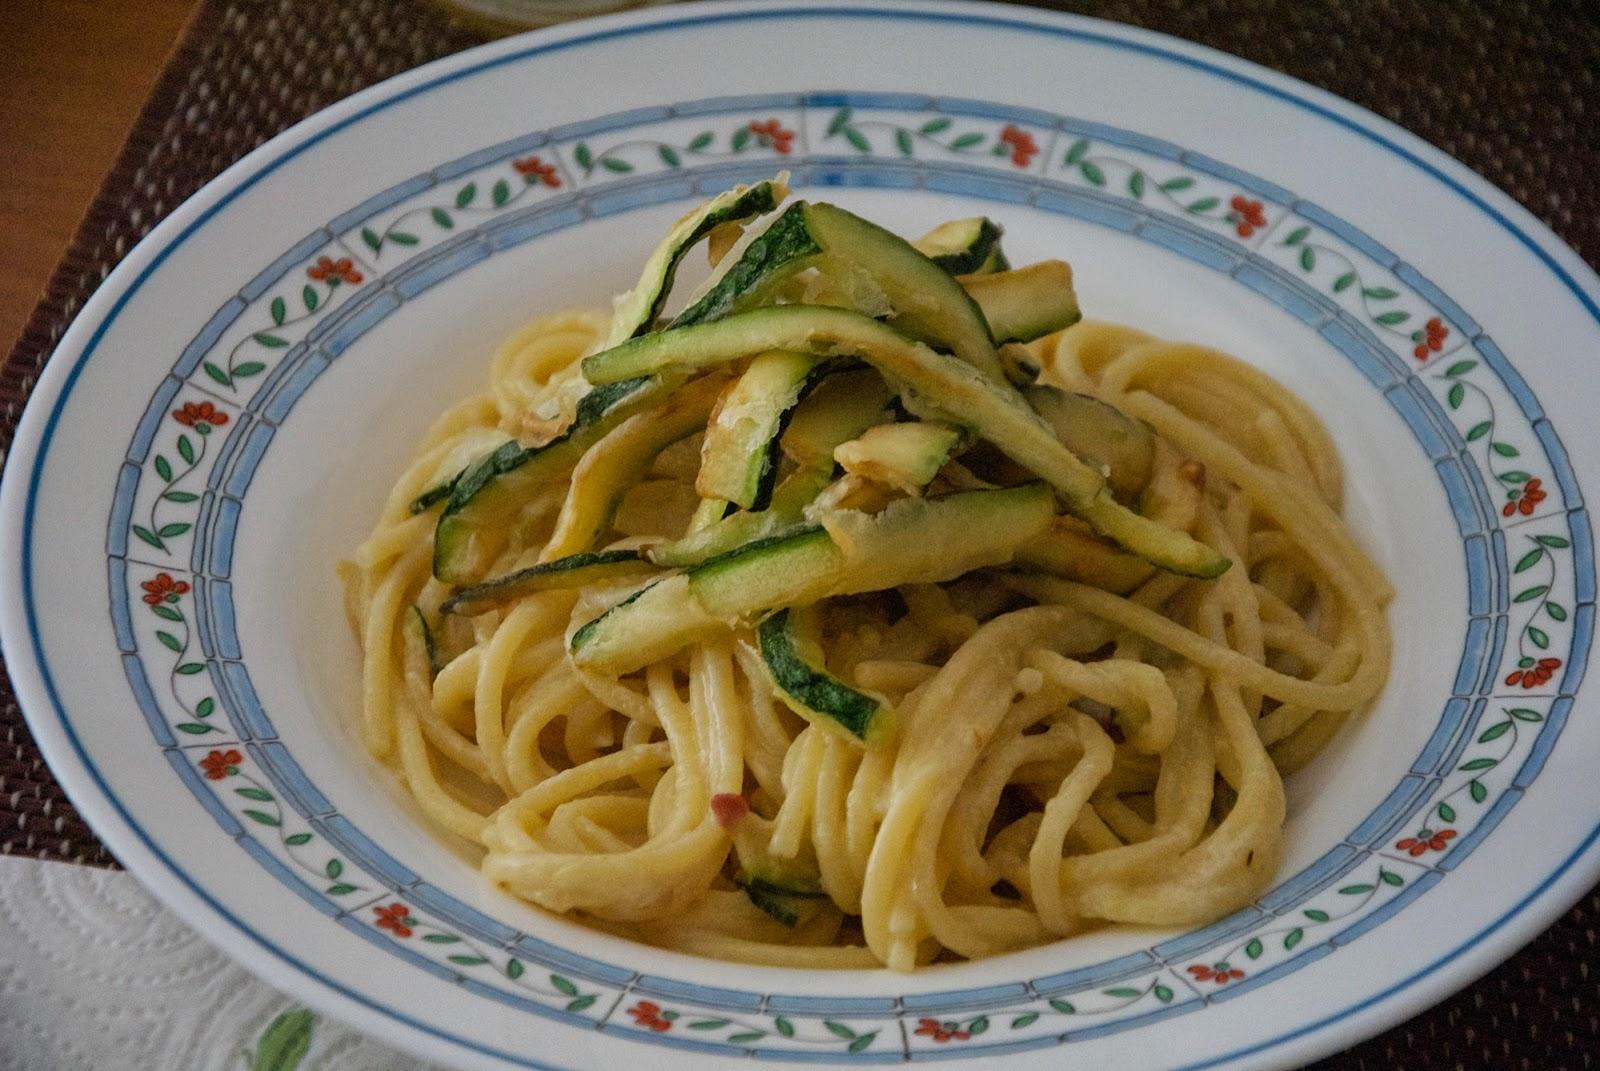 Ma perch mettere sotto sale zucchine patate e melanzane prima di cucinarle la chimica in - Chimica in cucina ...